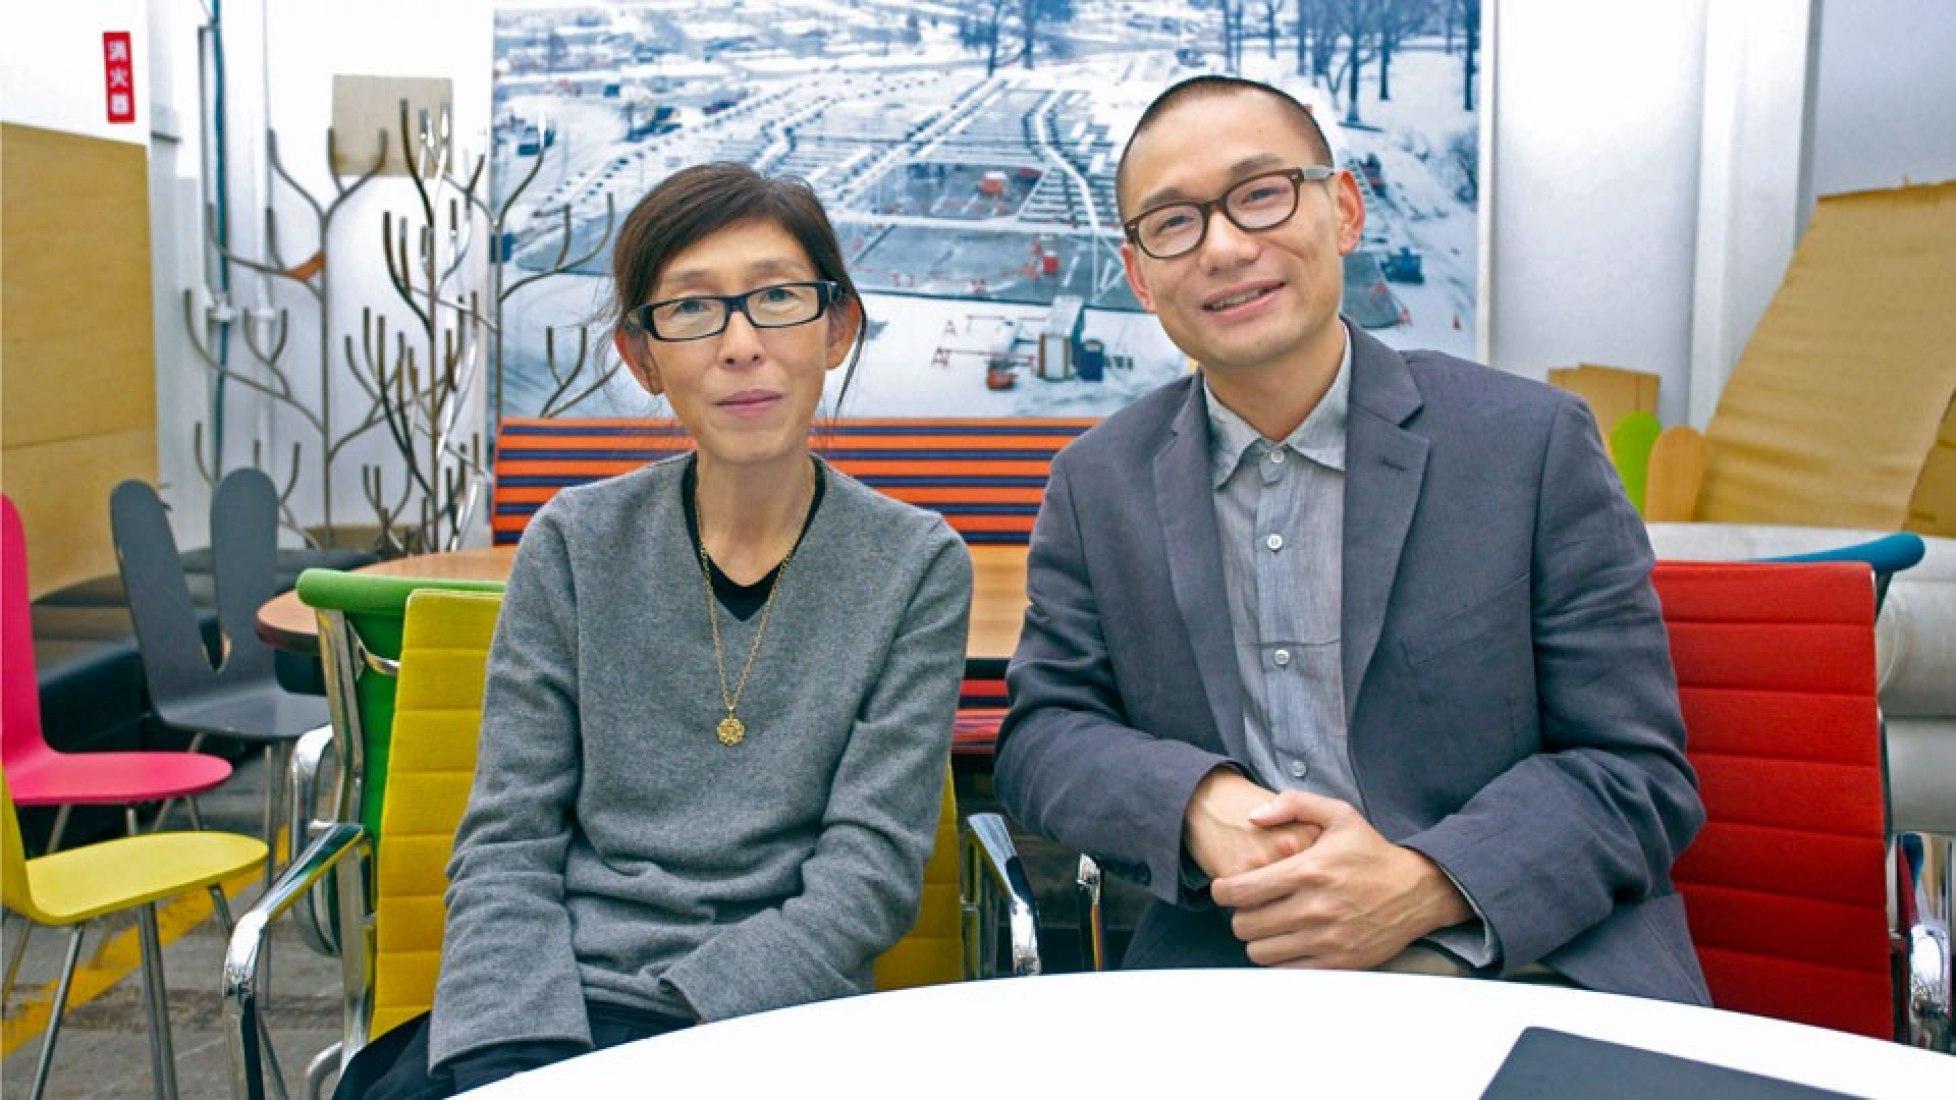 Kazuyo Sejima mentor and Yang Zhao protégé. Tokyo, Japan, 2012. Photography.- Rolex / Hideki Shiozawa.